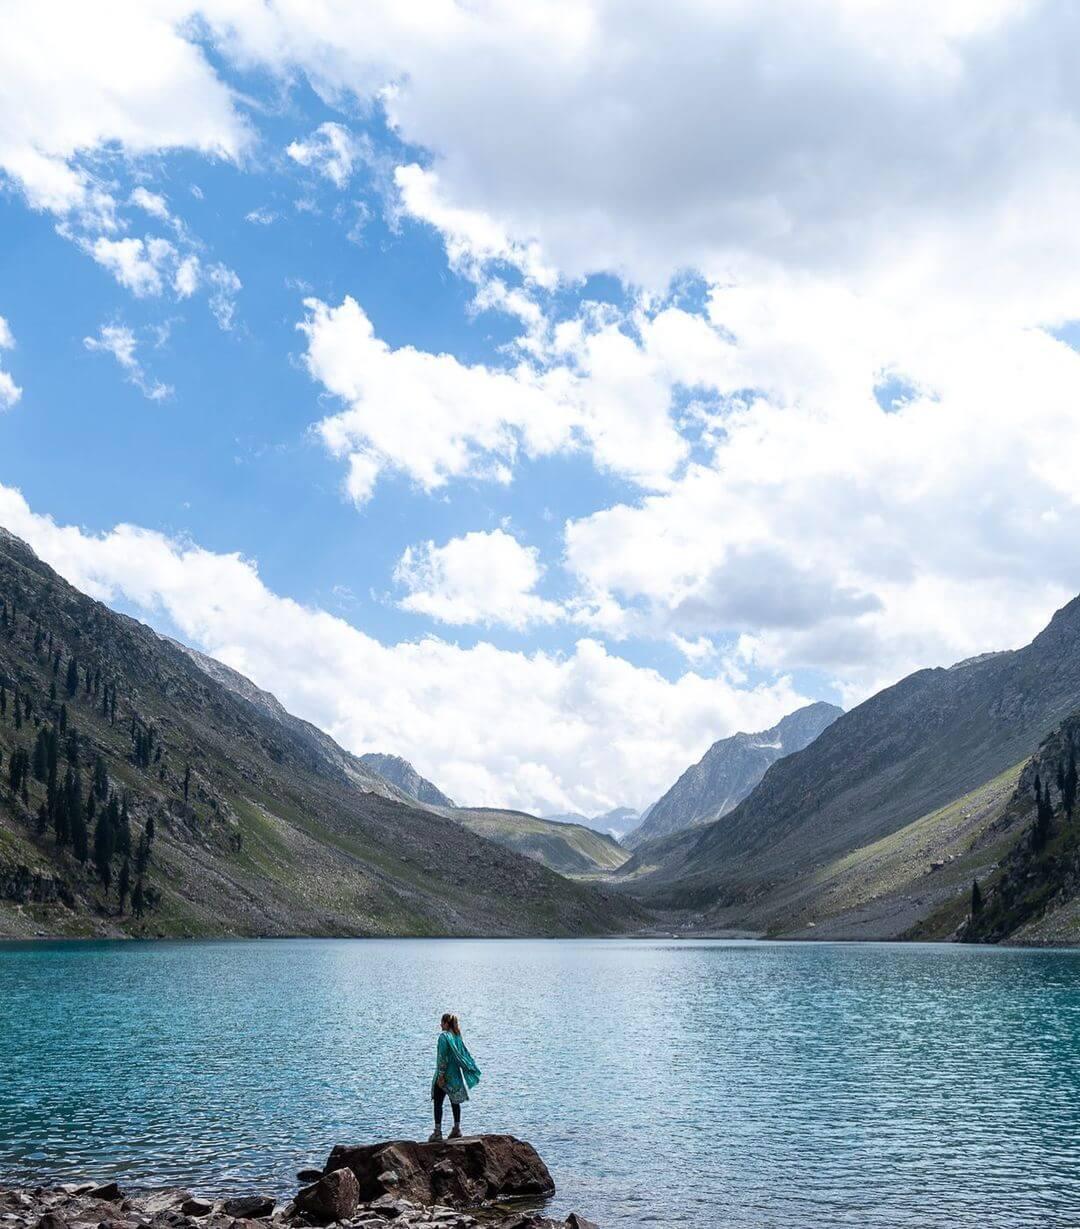 Samantha standing at a gorgeous laske in Pakistan